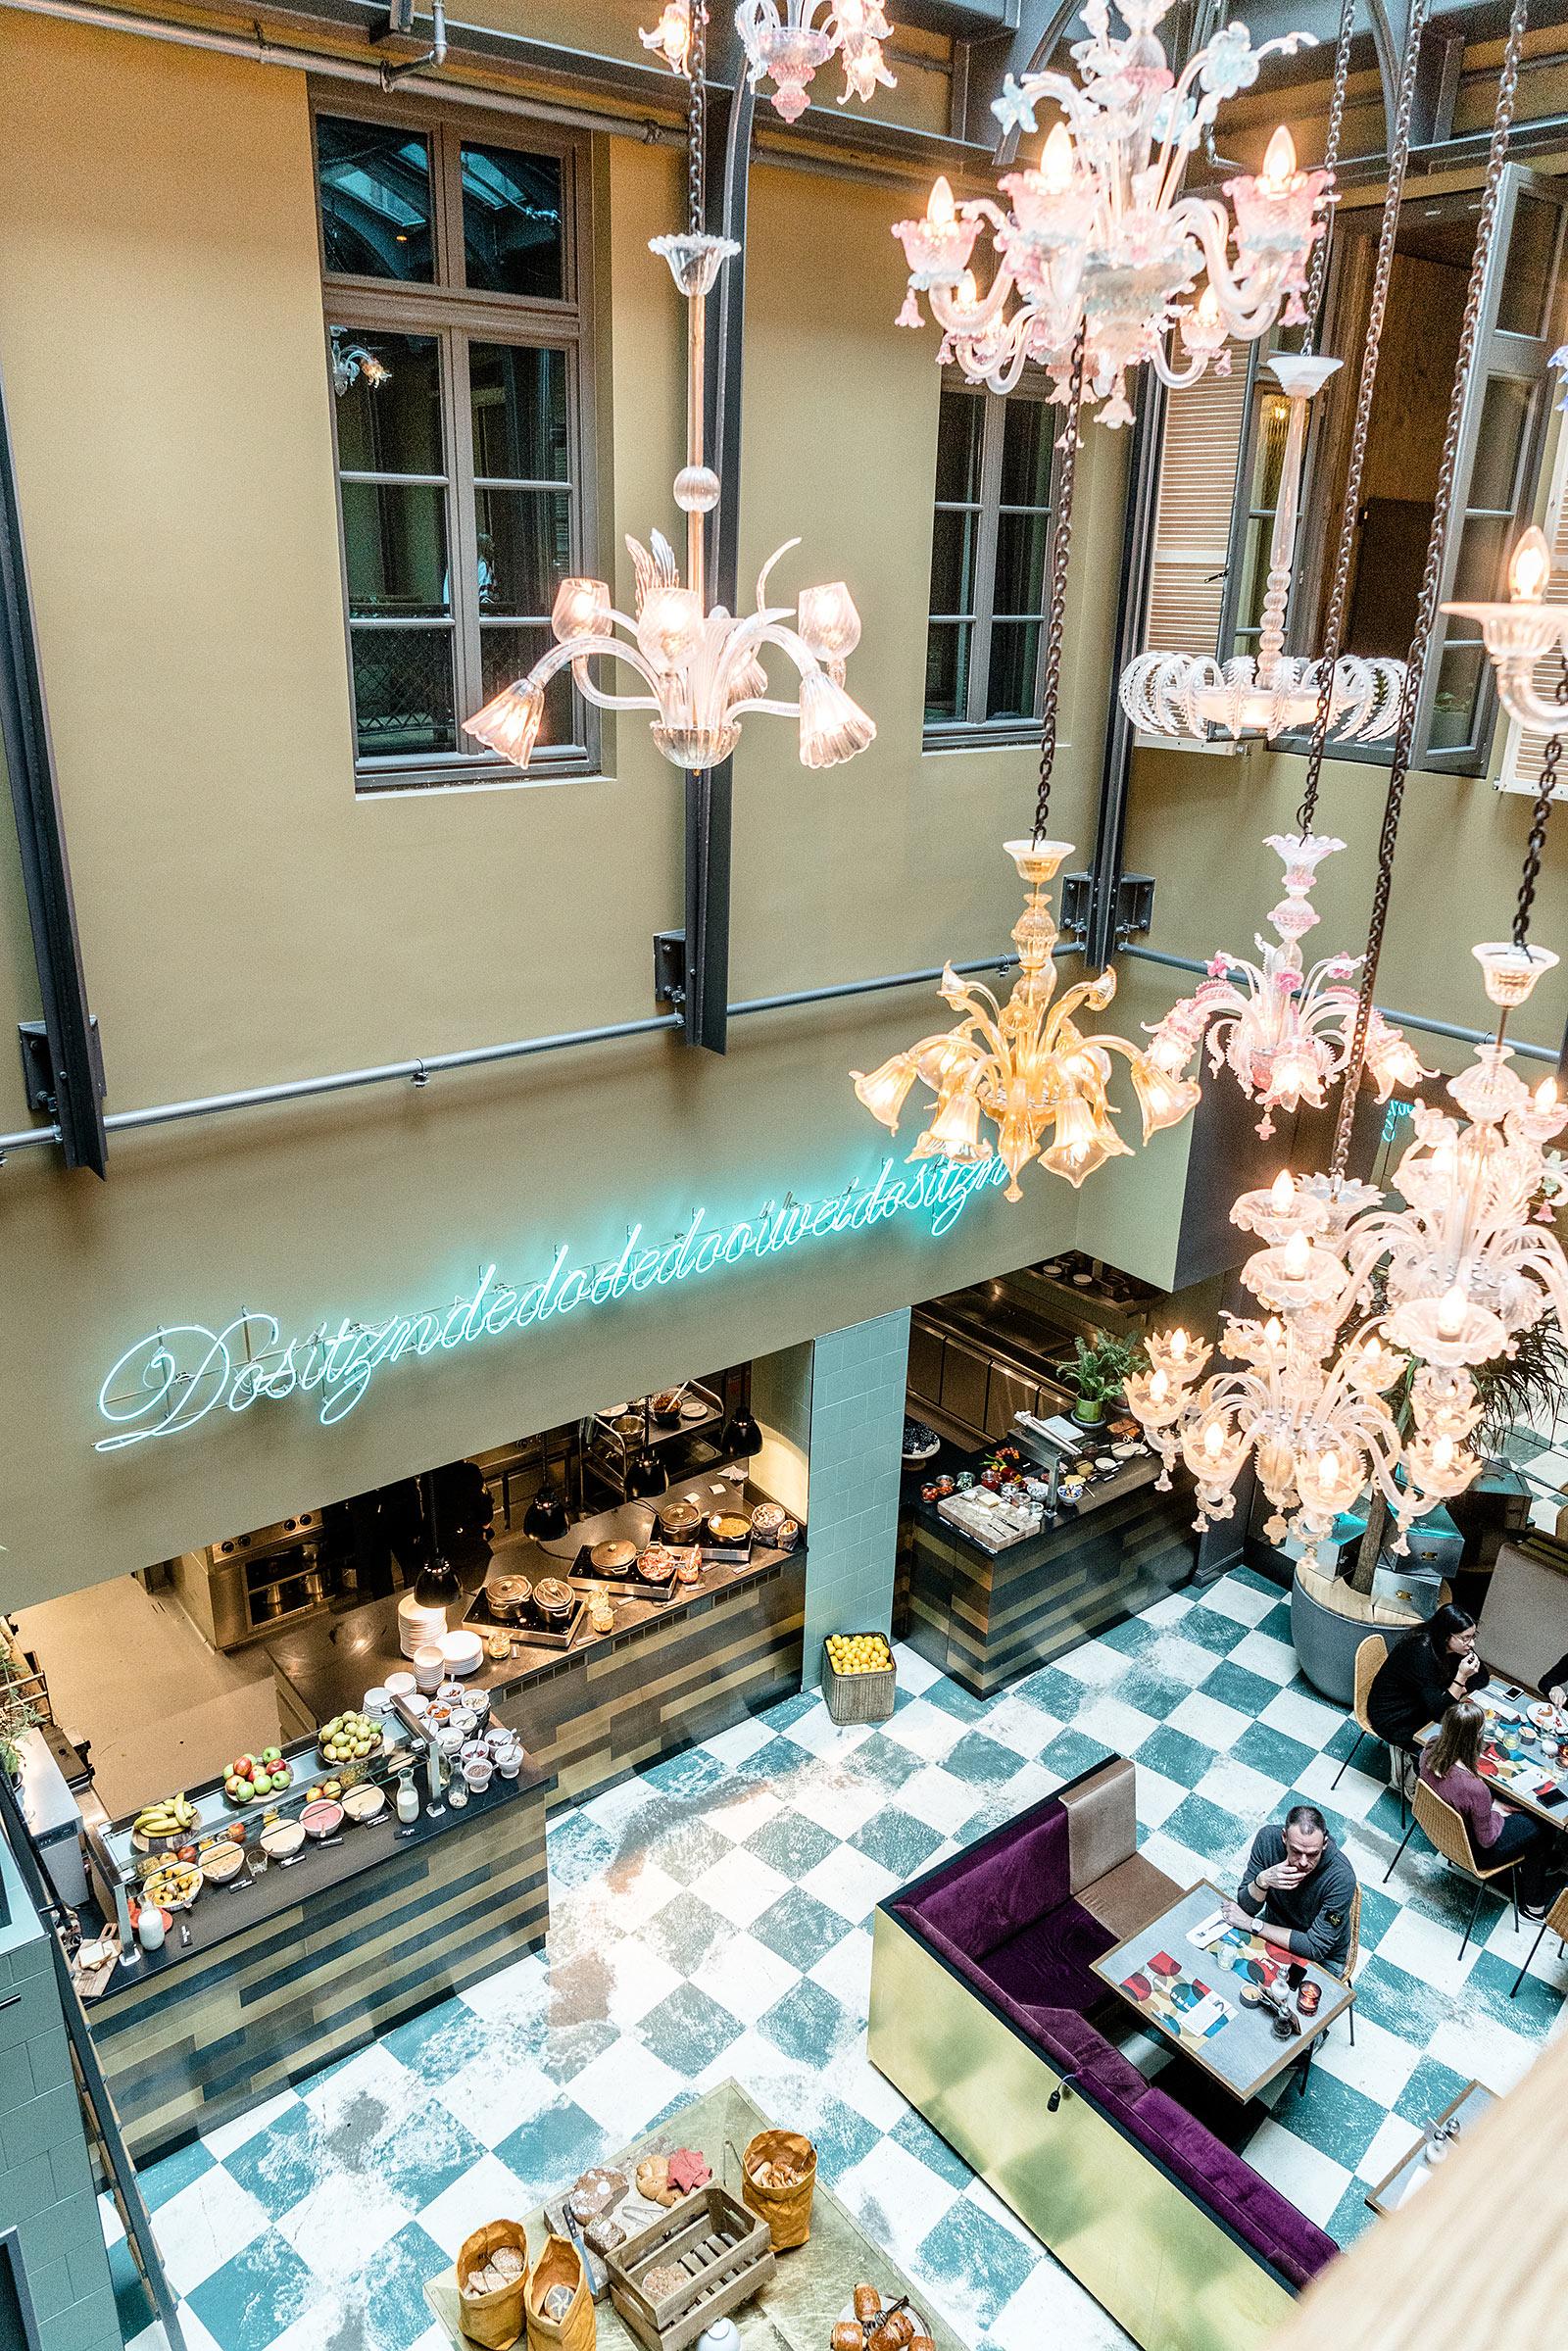 neni restaurant 25hours hotel münchen the royal bavarian travel blog sunnyinga